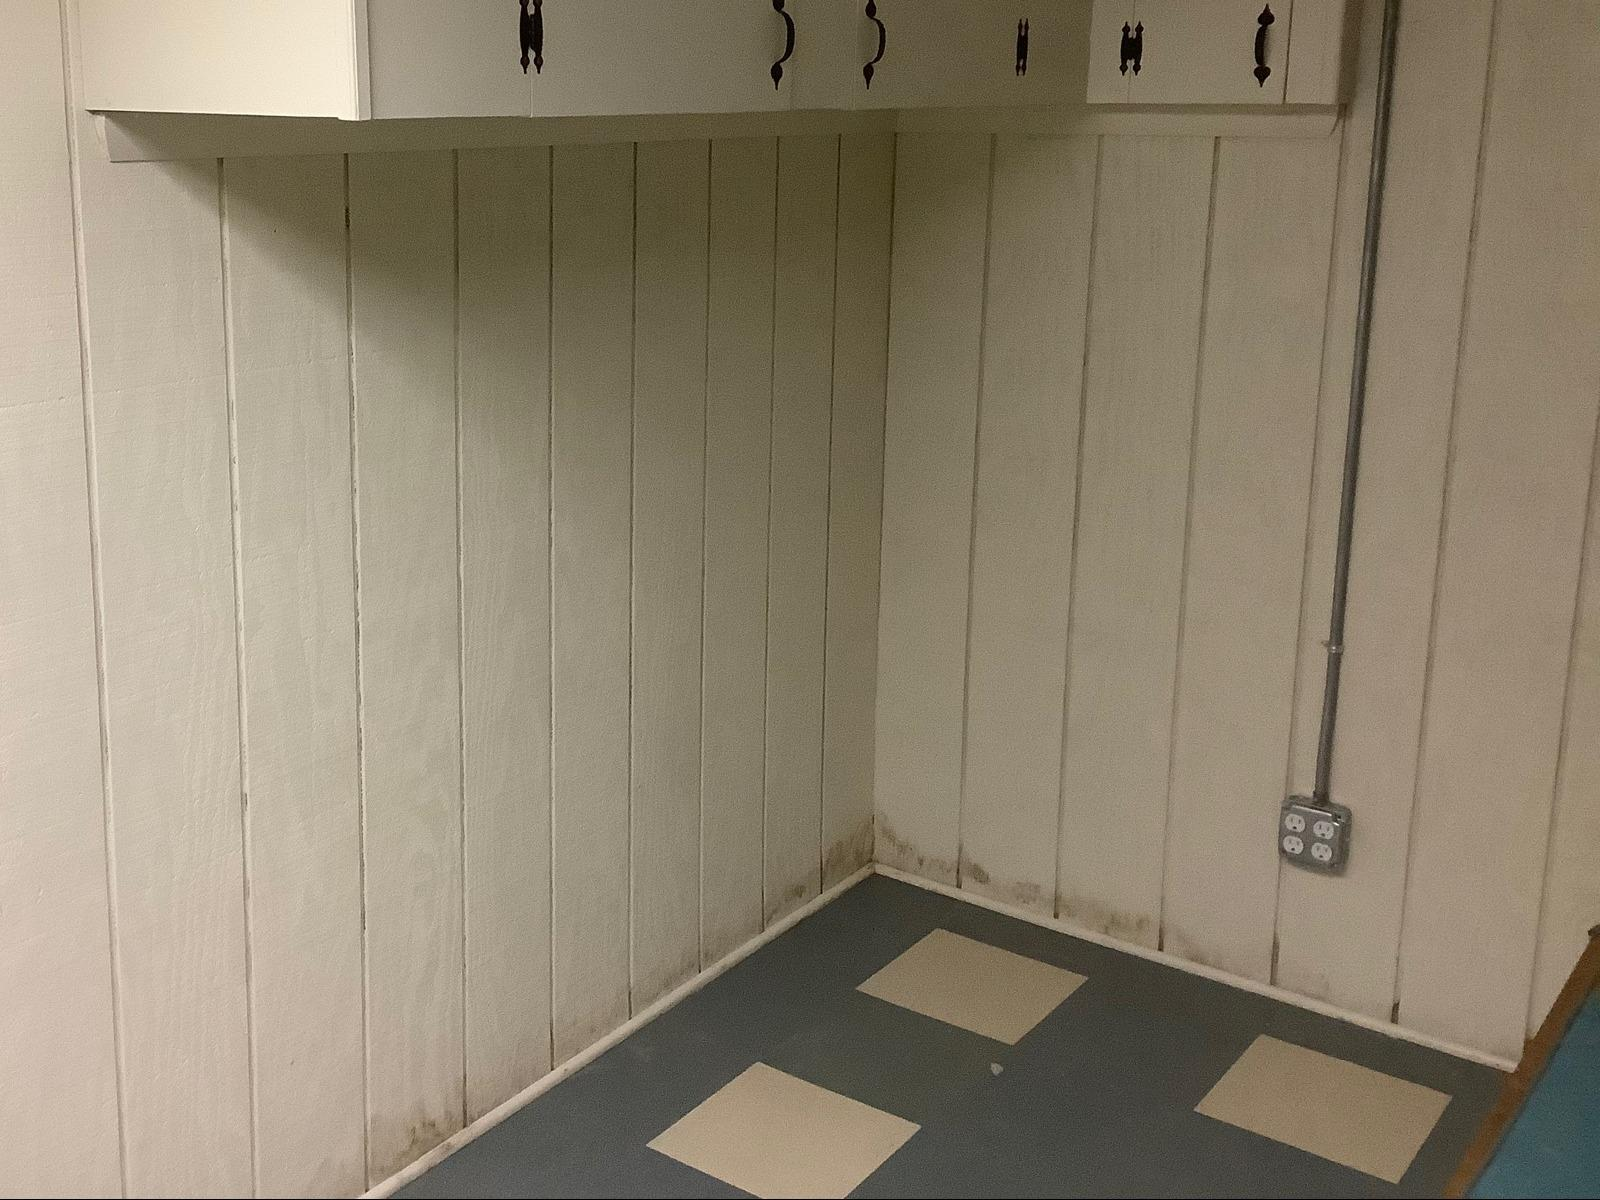 Staunton, VA Basement Waterproofing & Bowing Wall - Before Photo